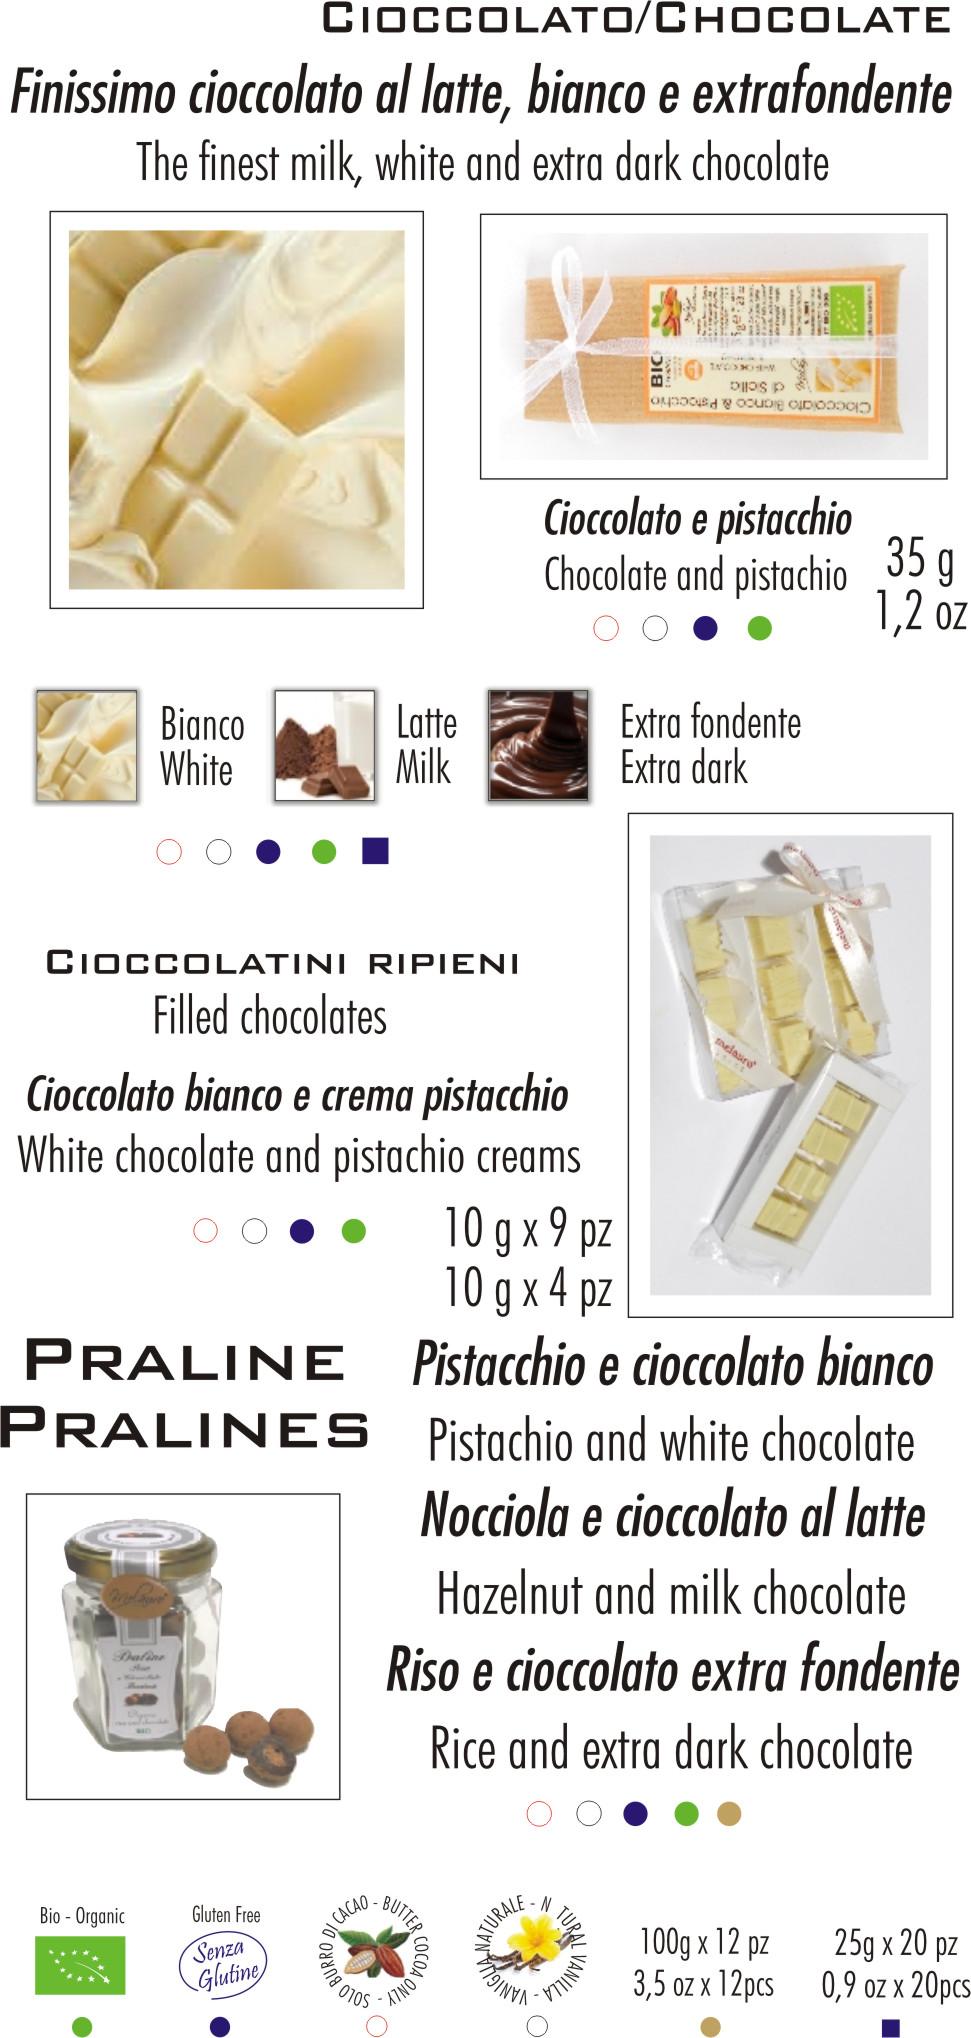 pagina cioccolato inglese.jpg